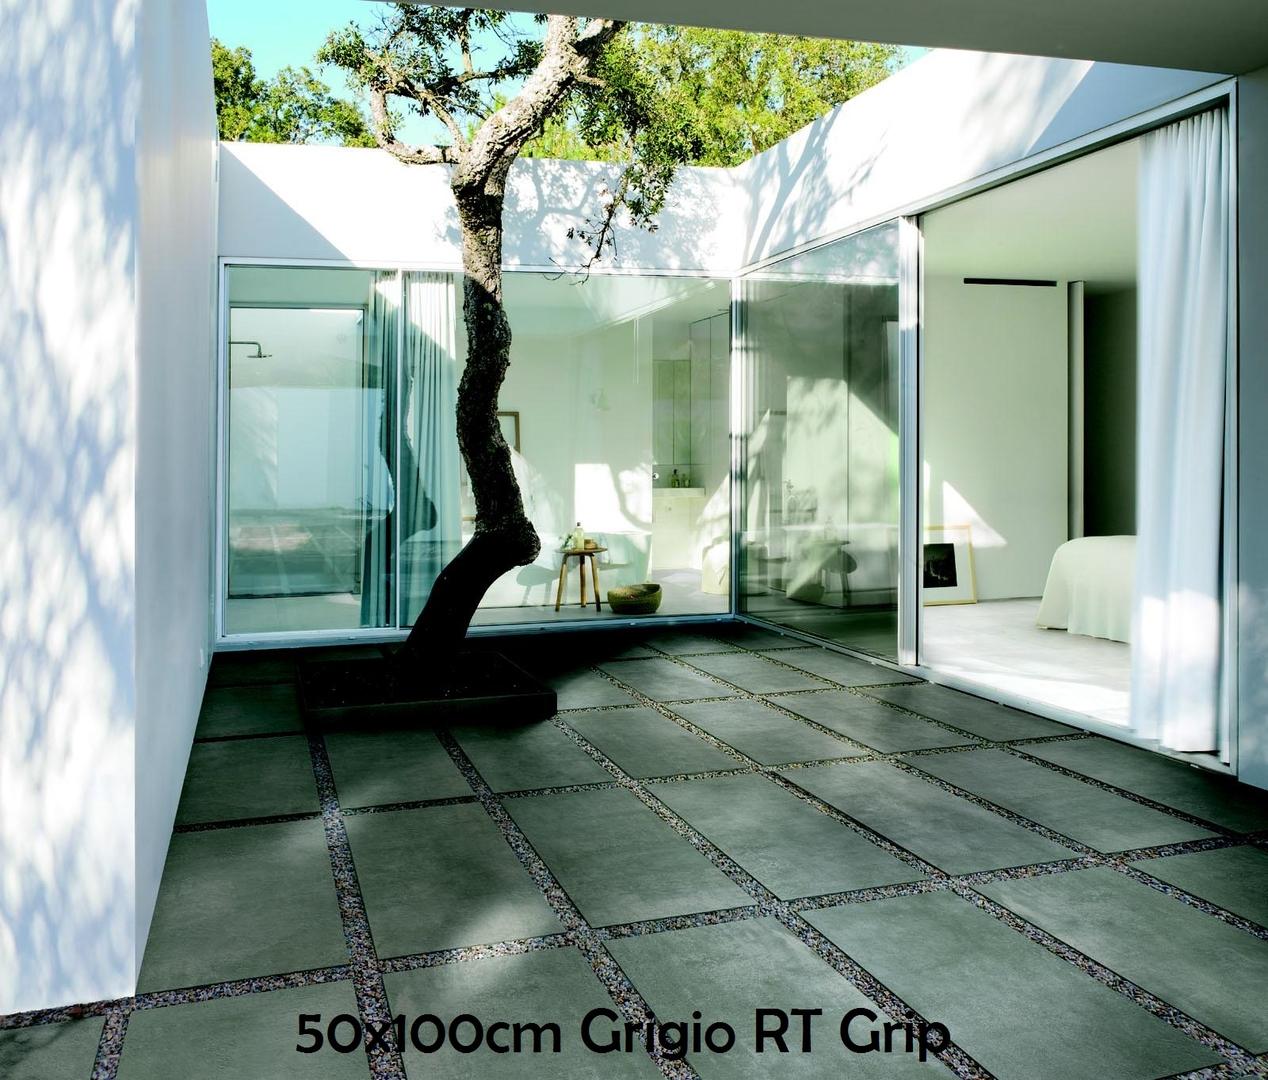 Marazzi 50x100cm Memento20 Grigio RT Grip (1)